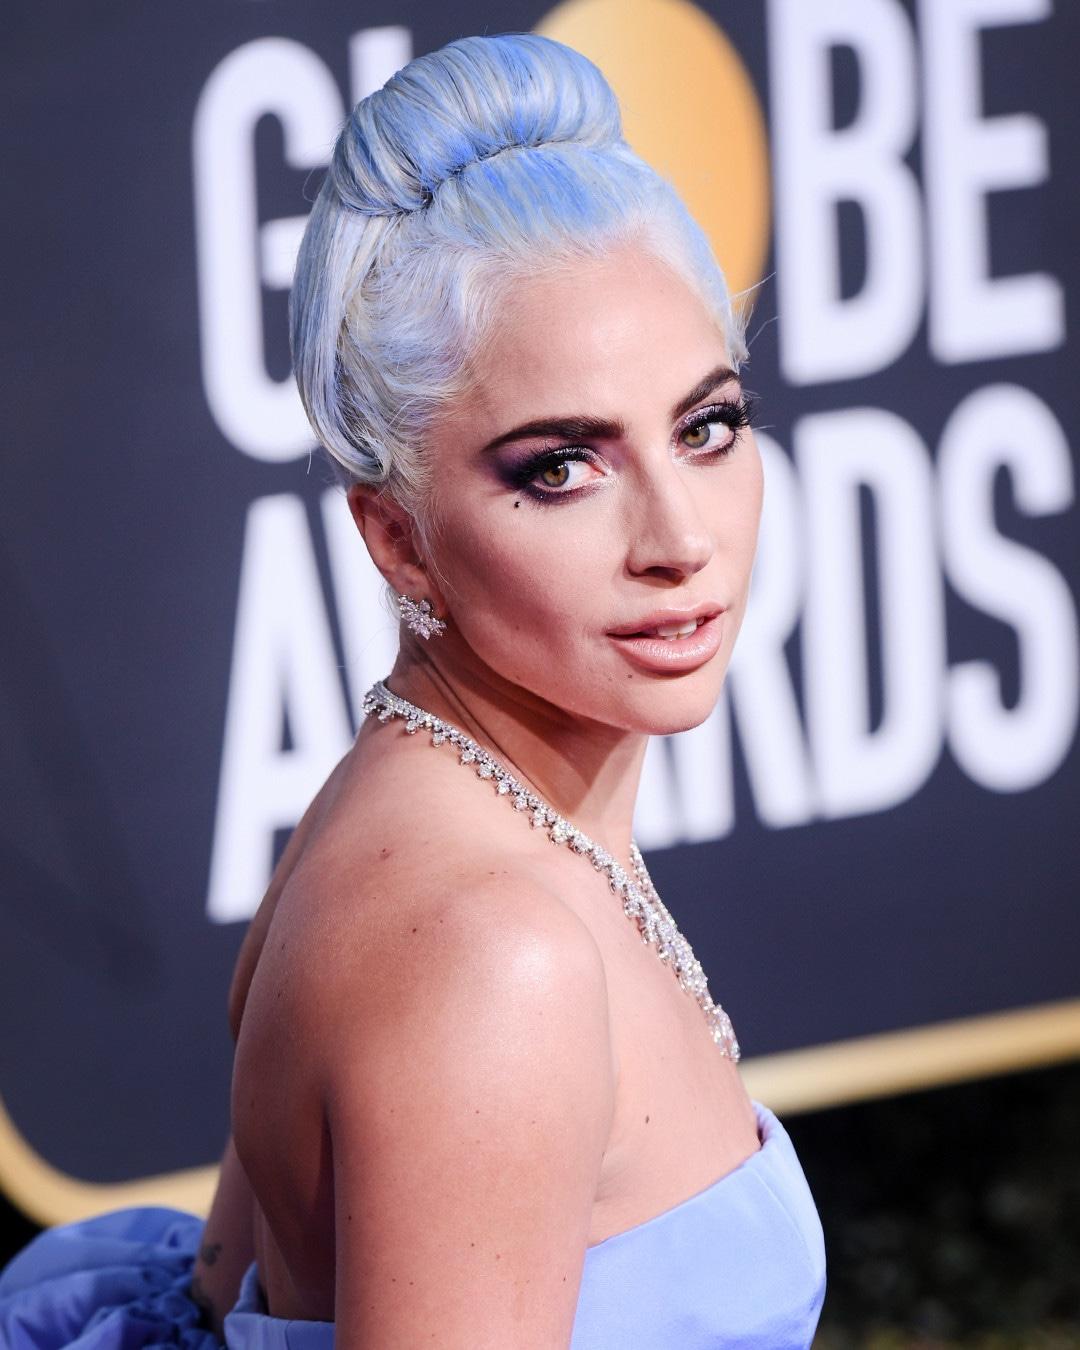 ESC: Golden Globes Beauty, Lady Gaga